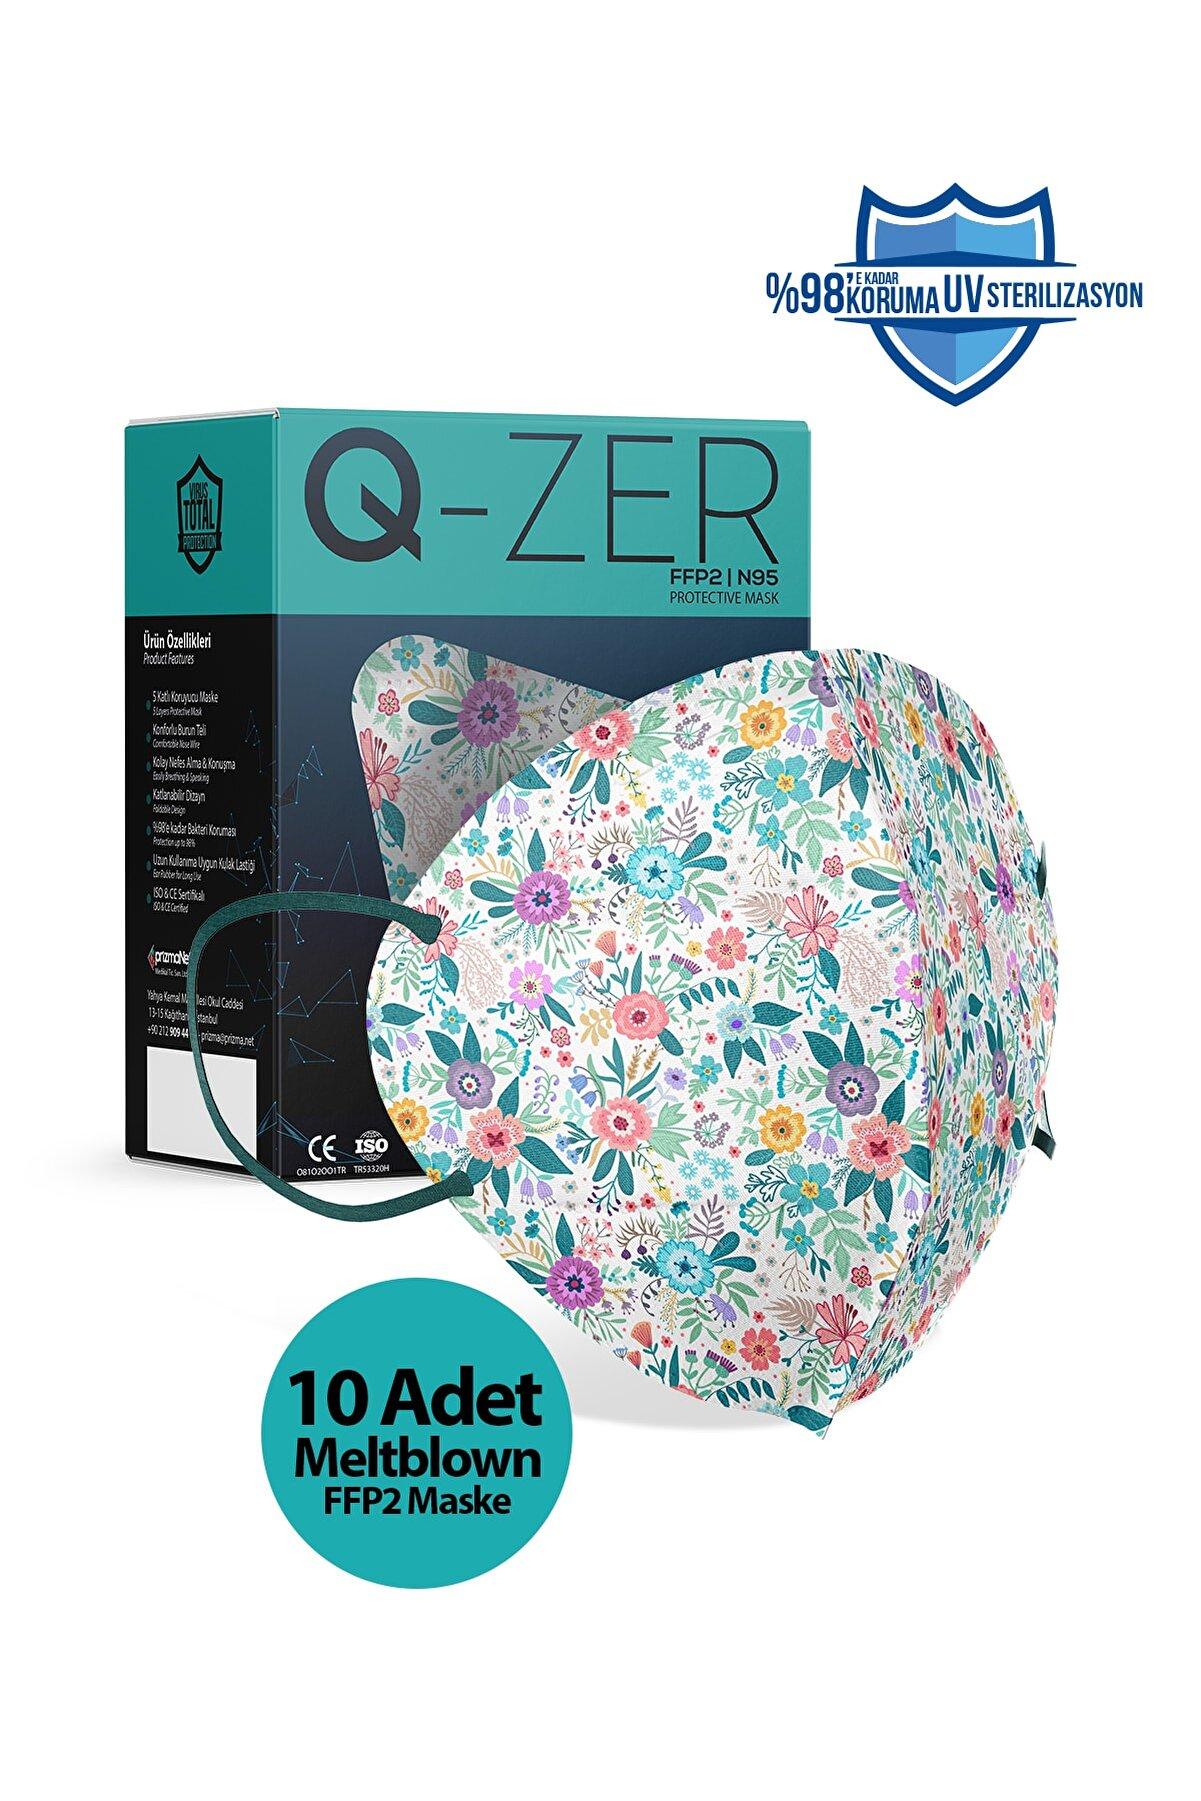 Medizer Qzer Bahar Çiçekleri Desenli N95 Maske 10 Adet